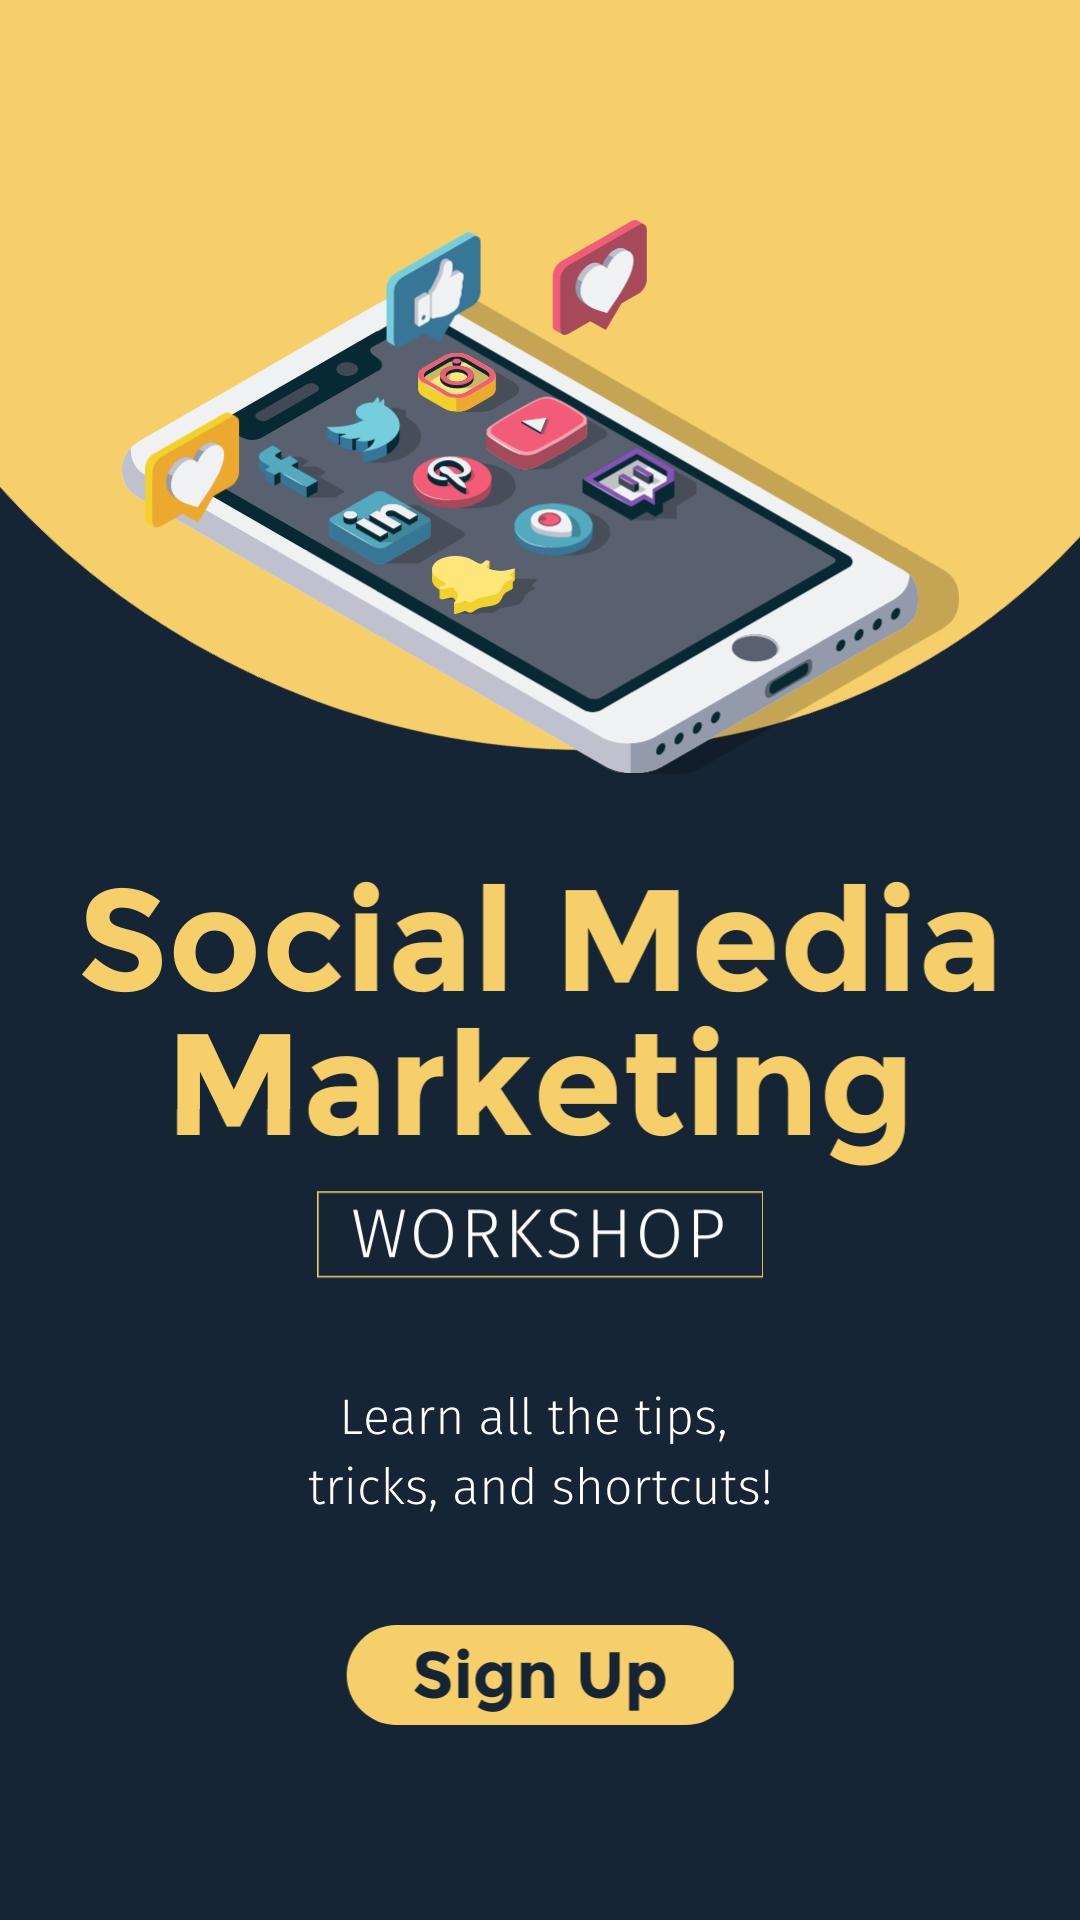 Social Media Mktg Vertical Template